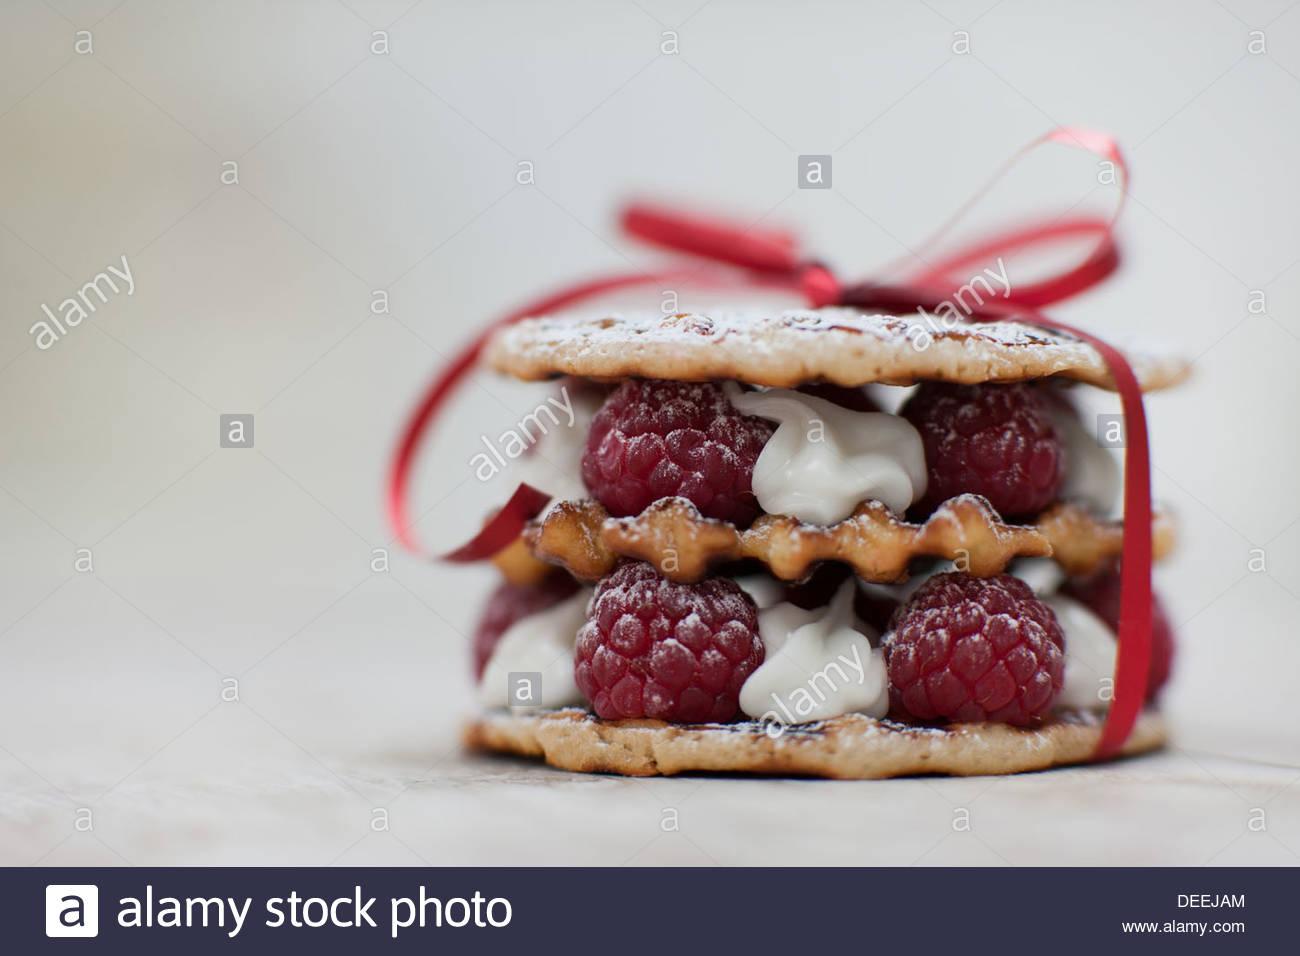 Close up of raspberry and cream cookie dessert - Stock Image